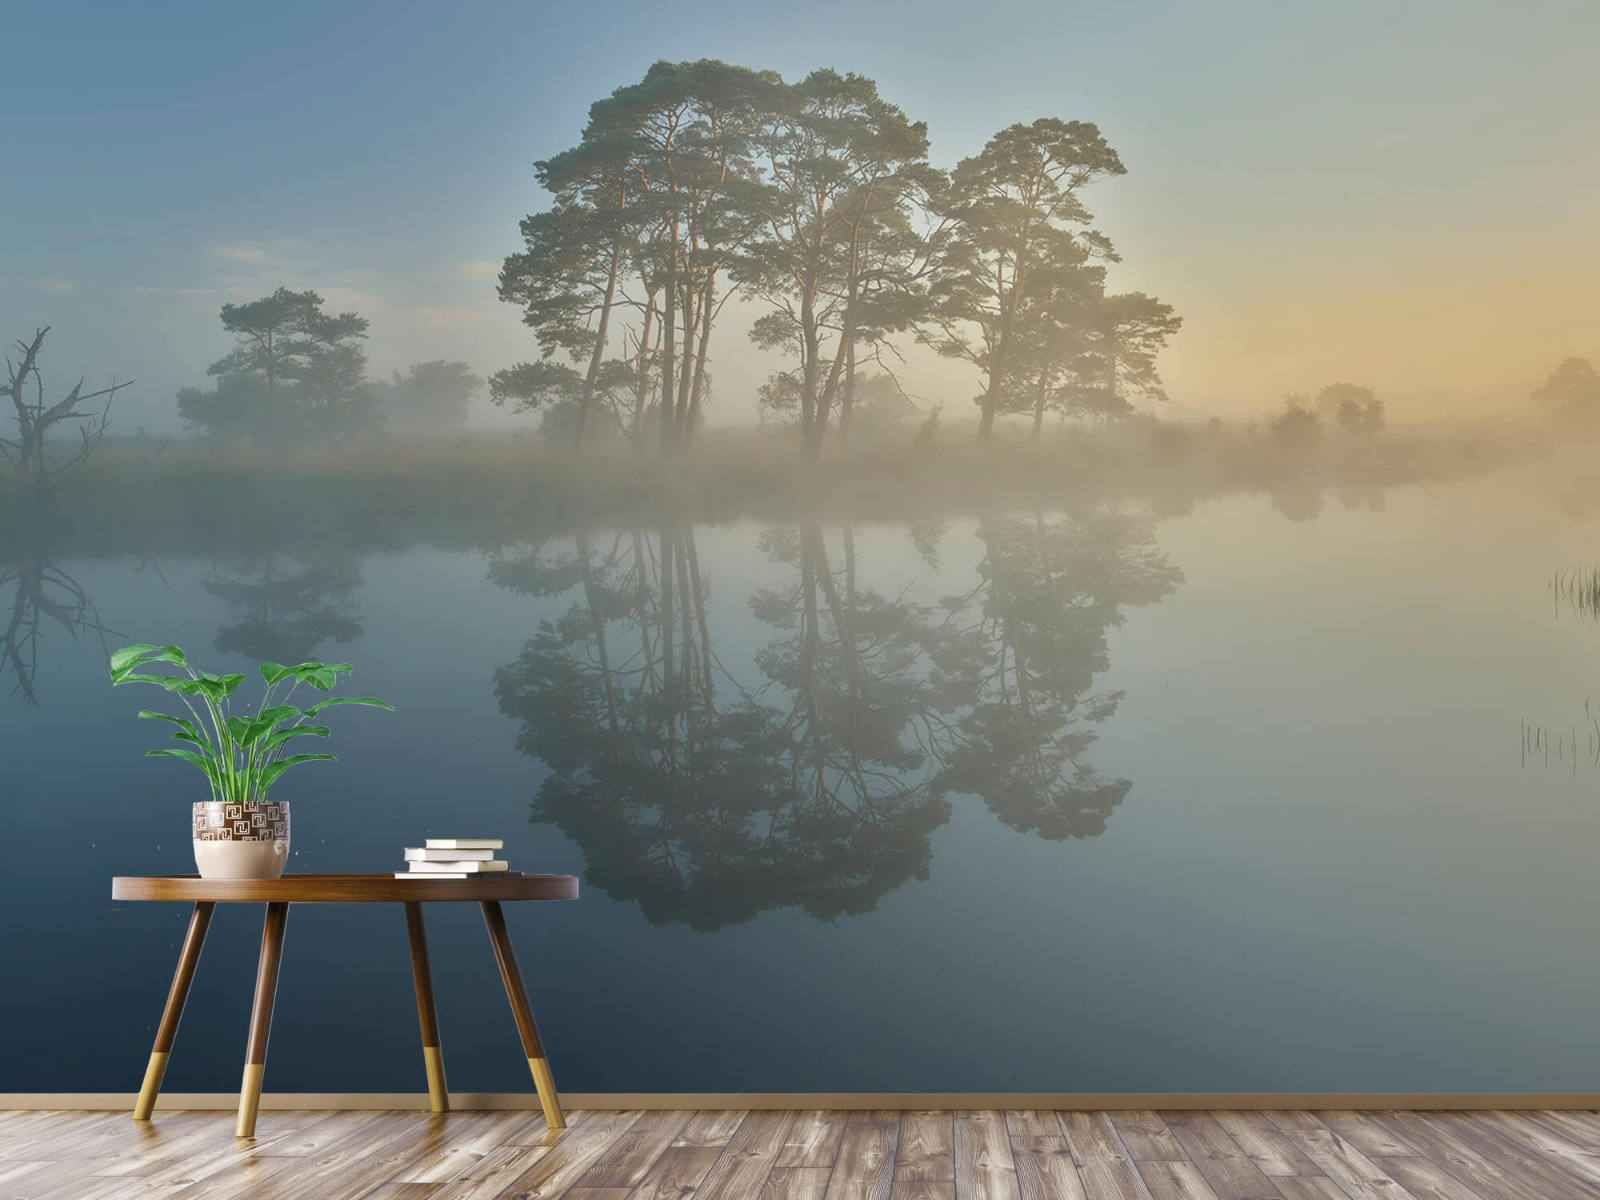 Natuur - Mist in heidegebied 6